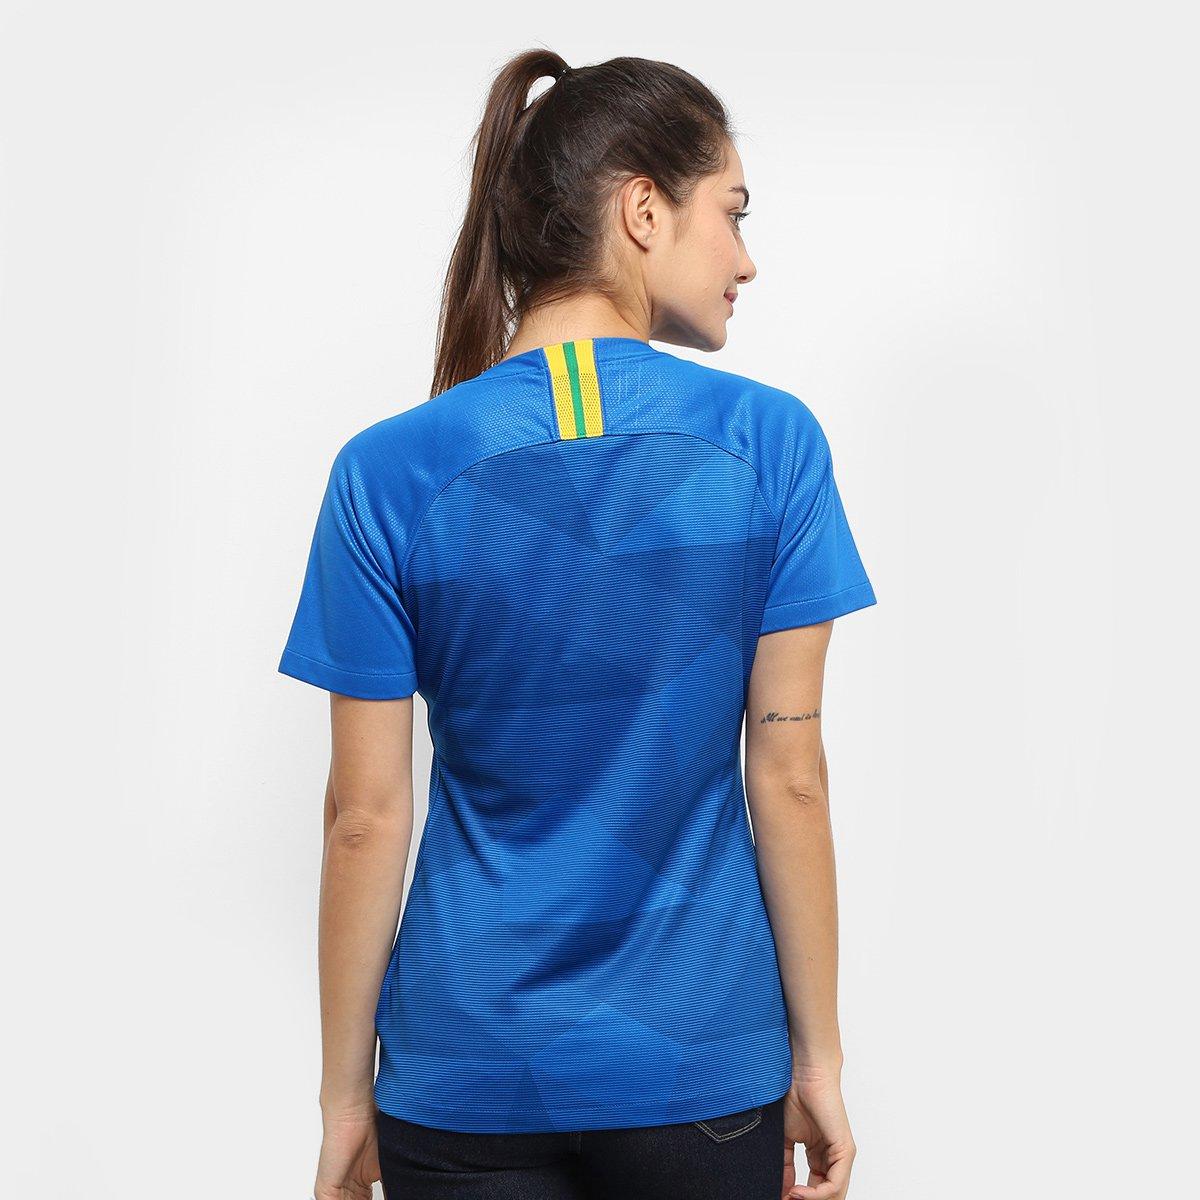 26b5e3cd6e Camisa Seleção Brasil II 2018 s n° - Torcedor Nike Feminina - Azul ...